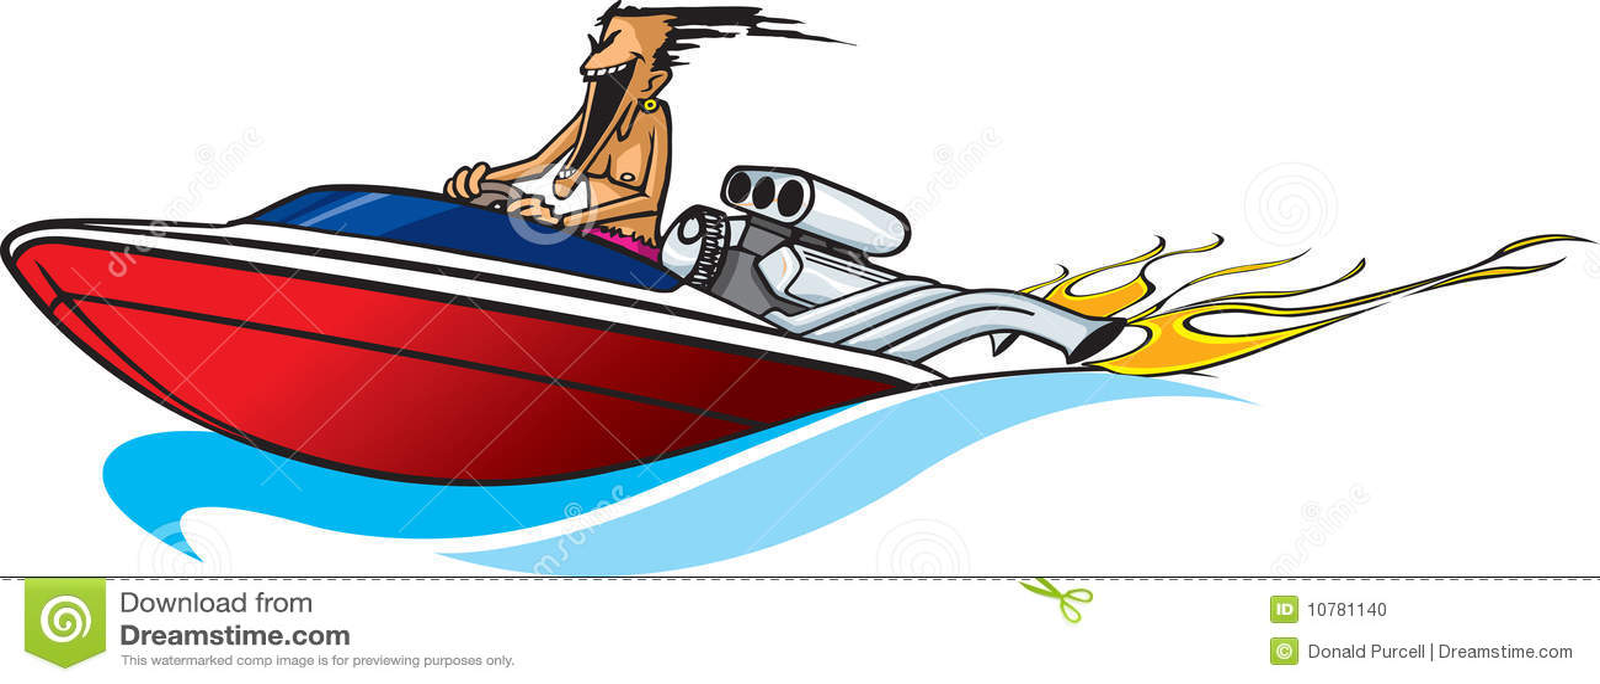 clipart power boat - photo #50